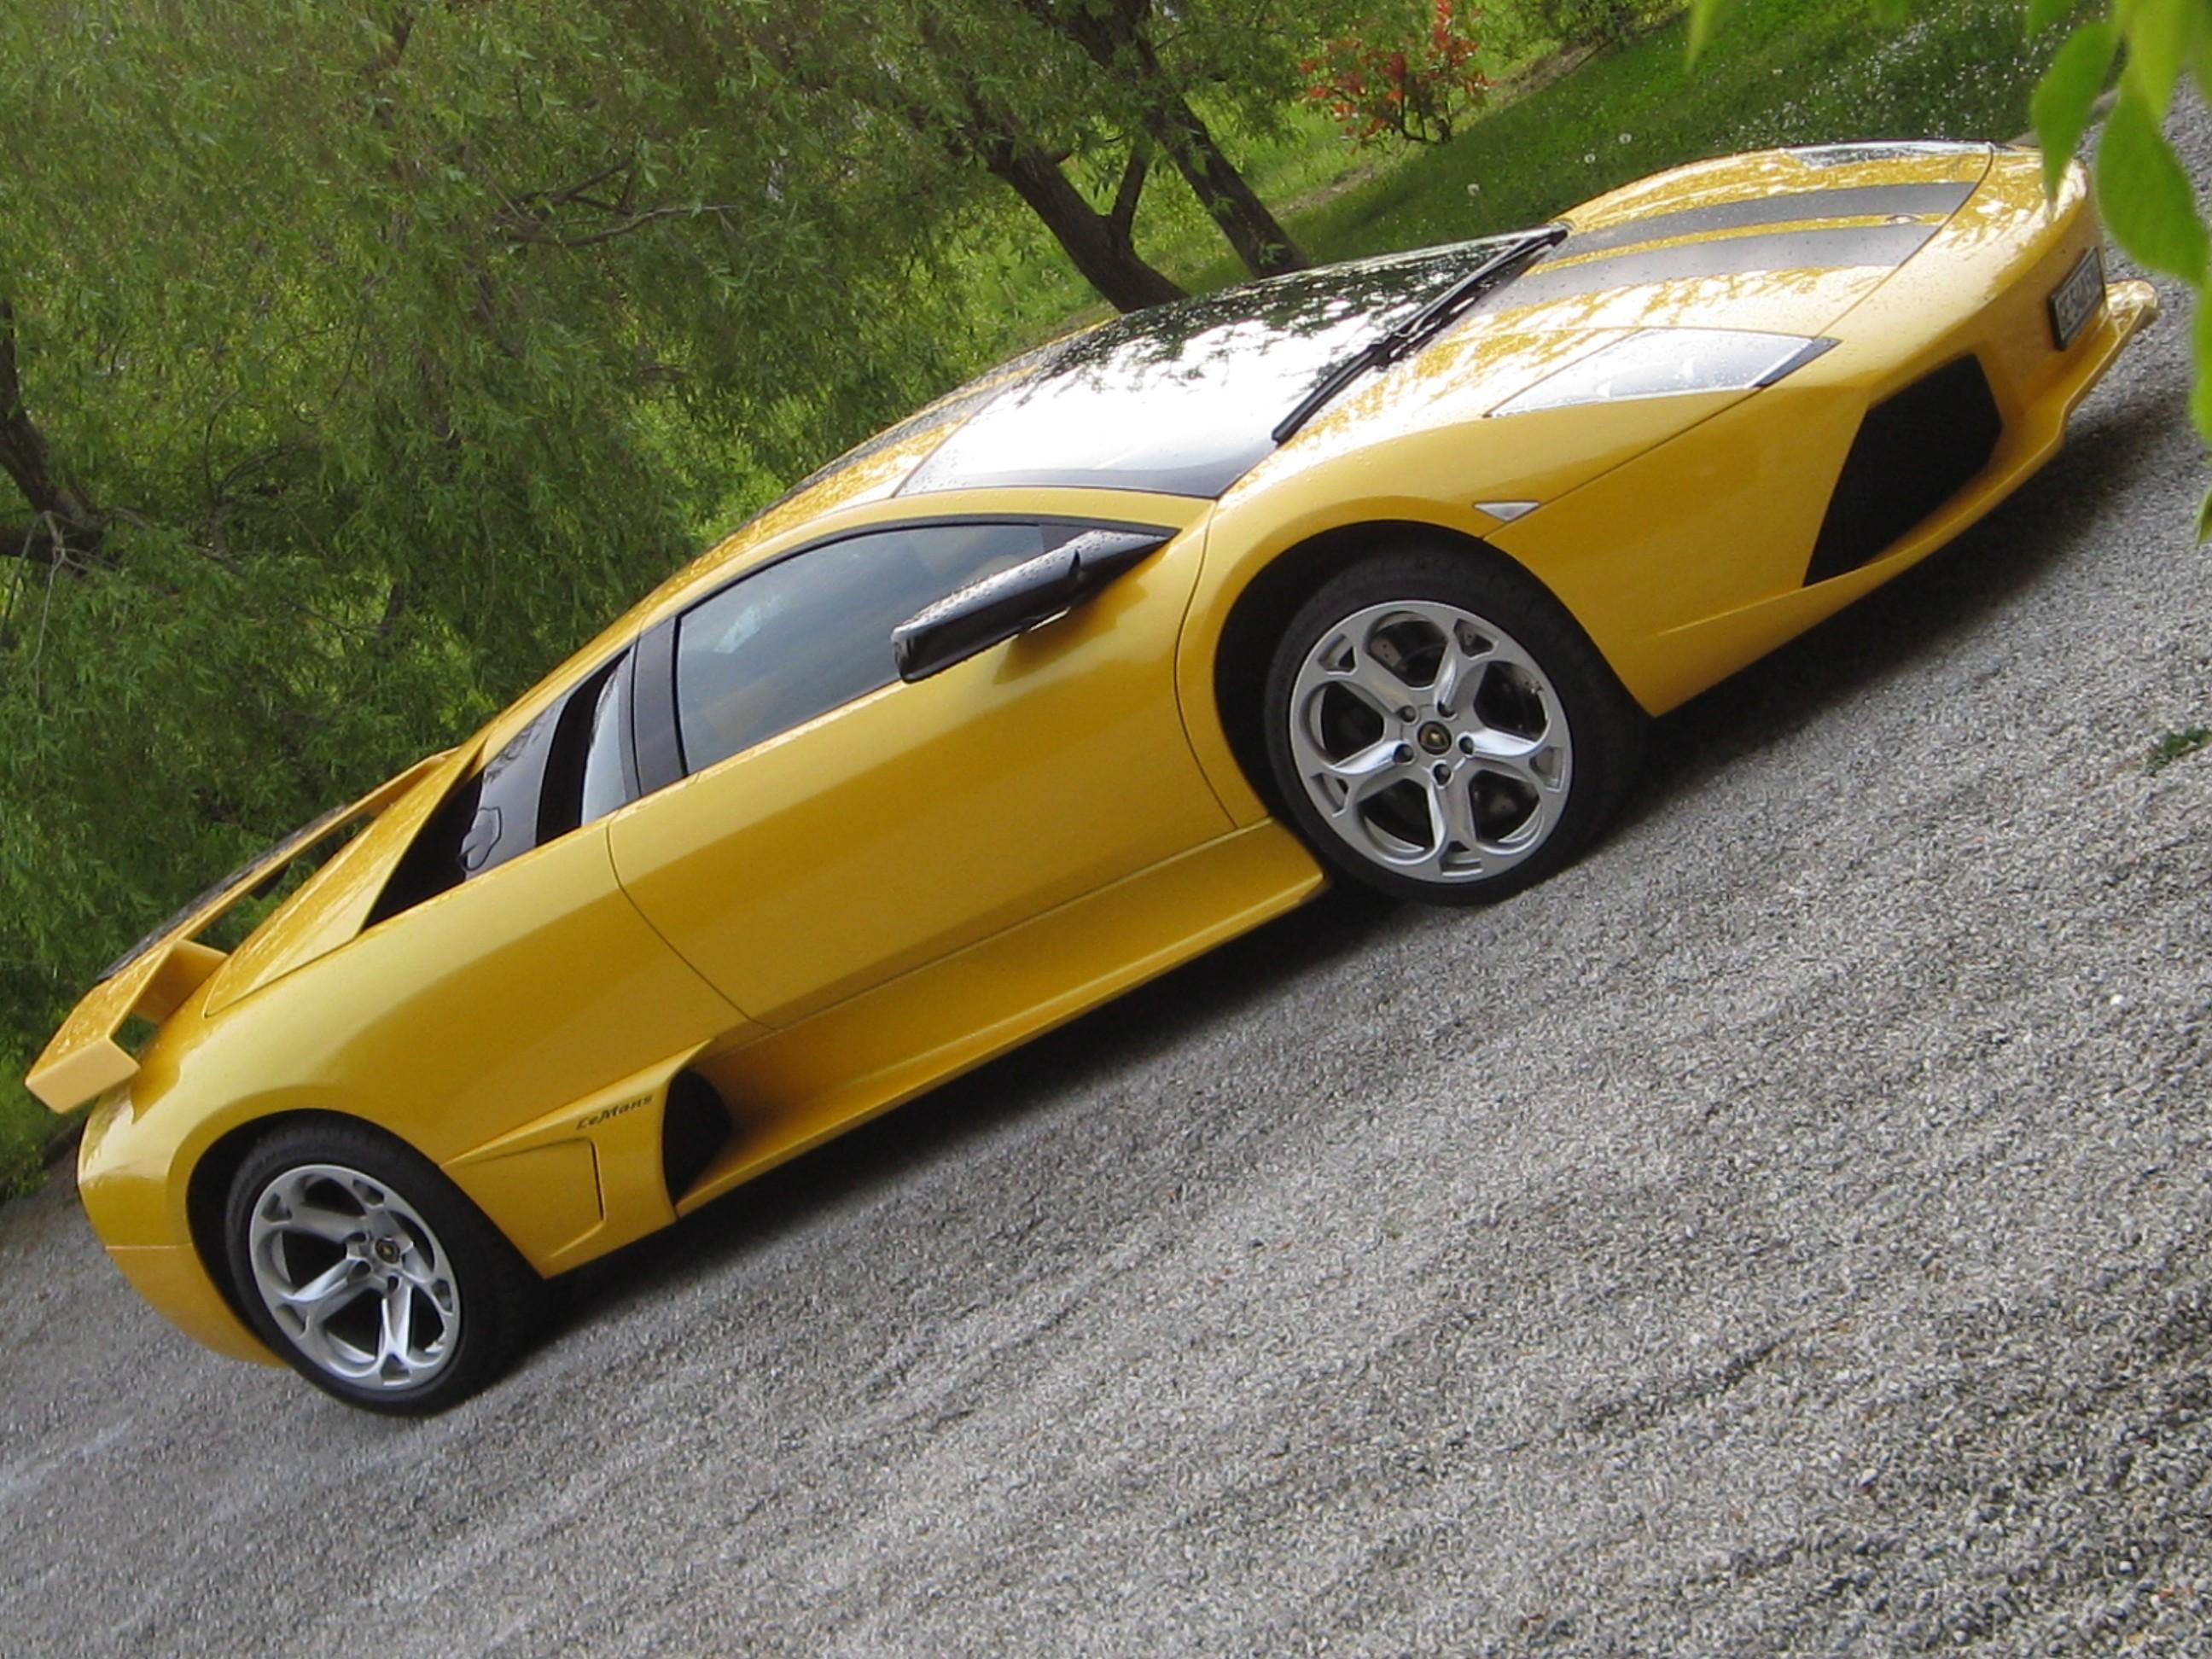 2b74670117 Wonderful Lamborghini Countach Strohm De Rella Cars Trend